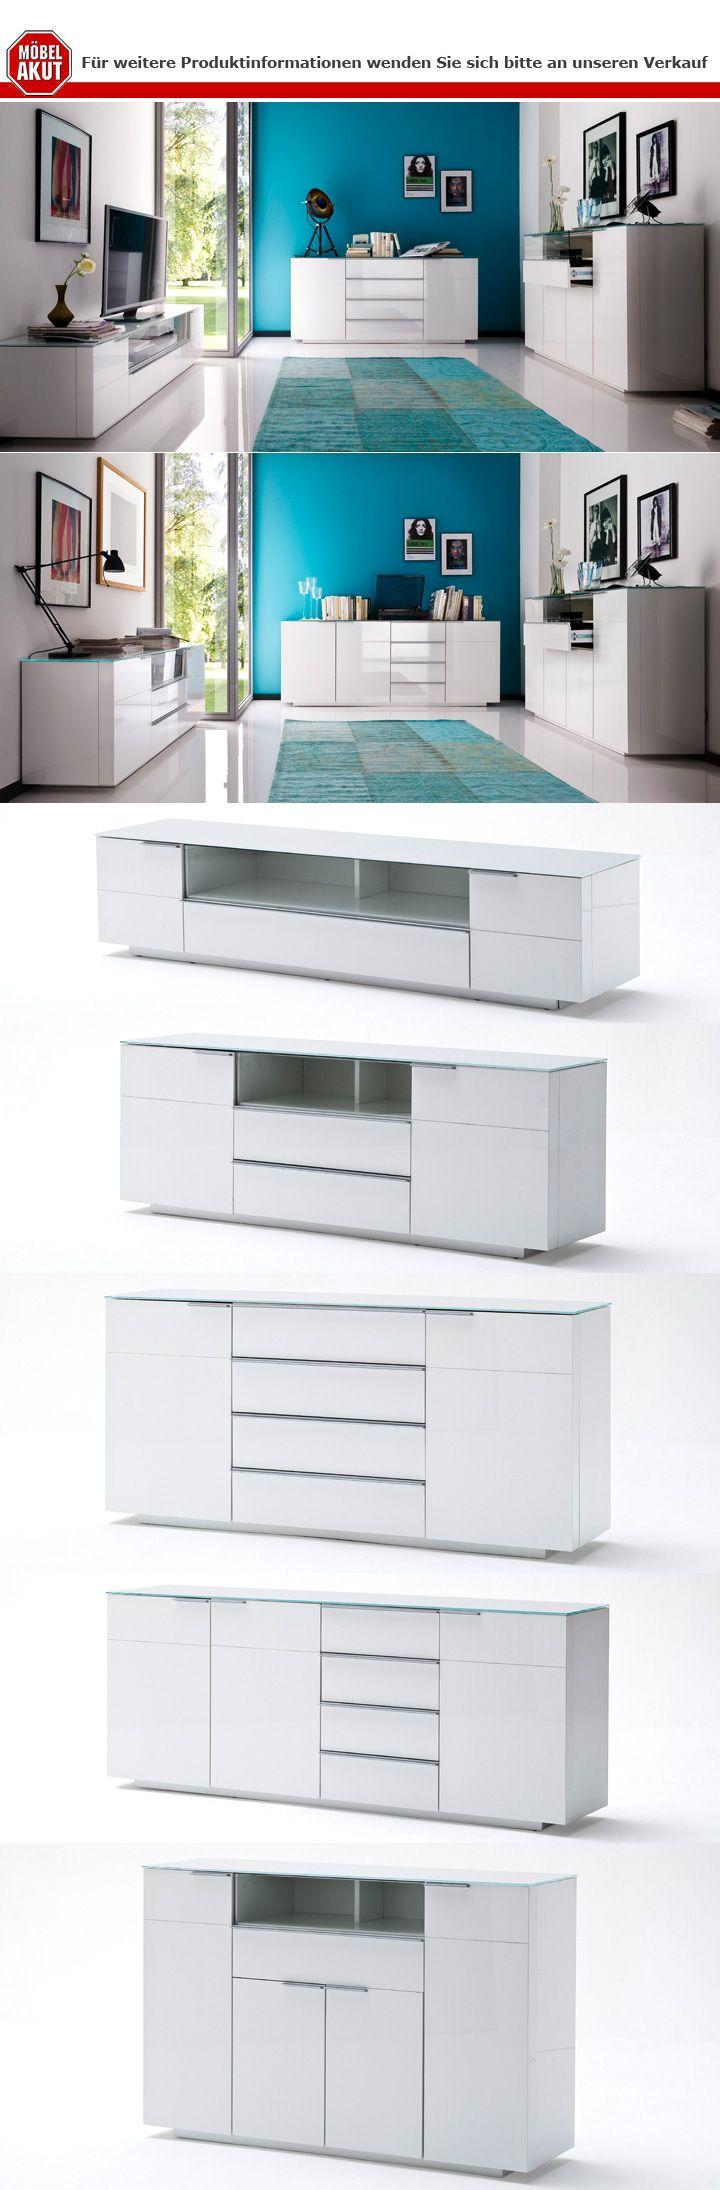 sideboard 1 canberra wei hochglanz lackiert glasplatte. Black Bedroom Furniture Sets. Home Design Ideas